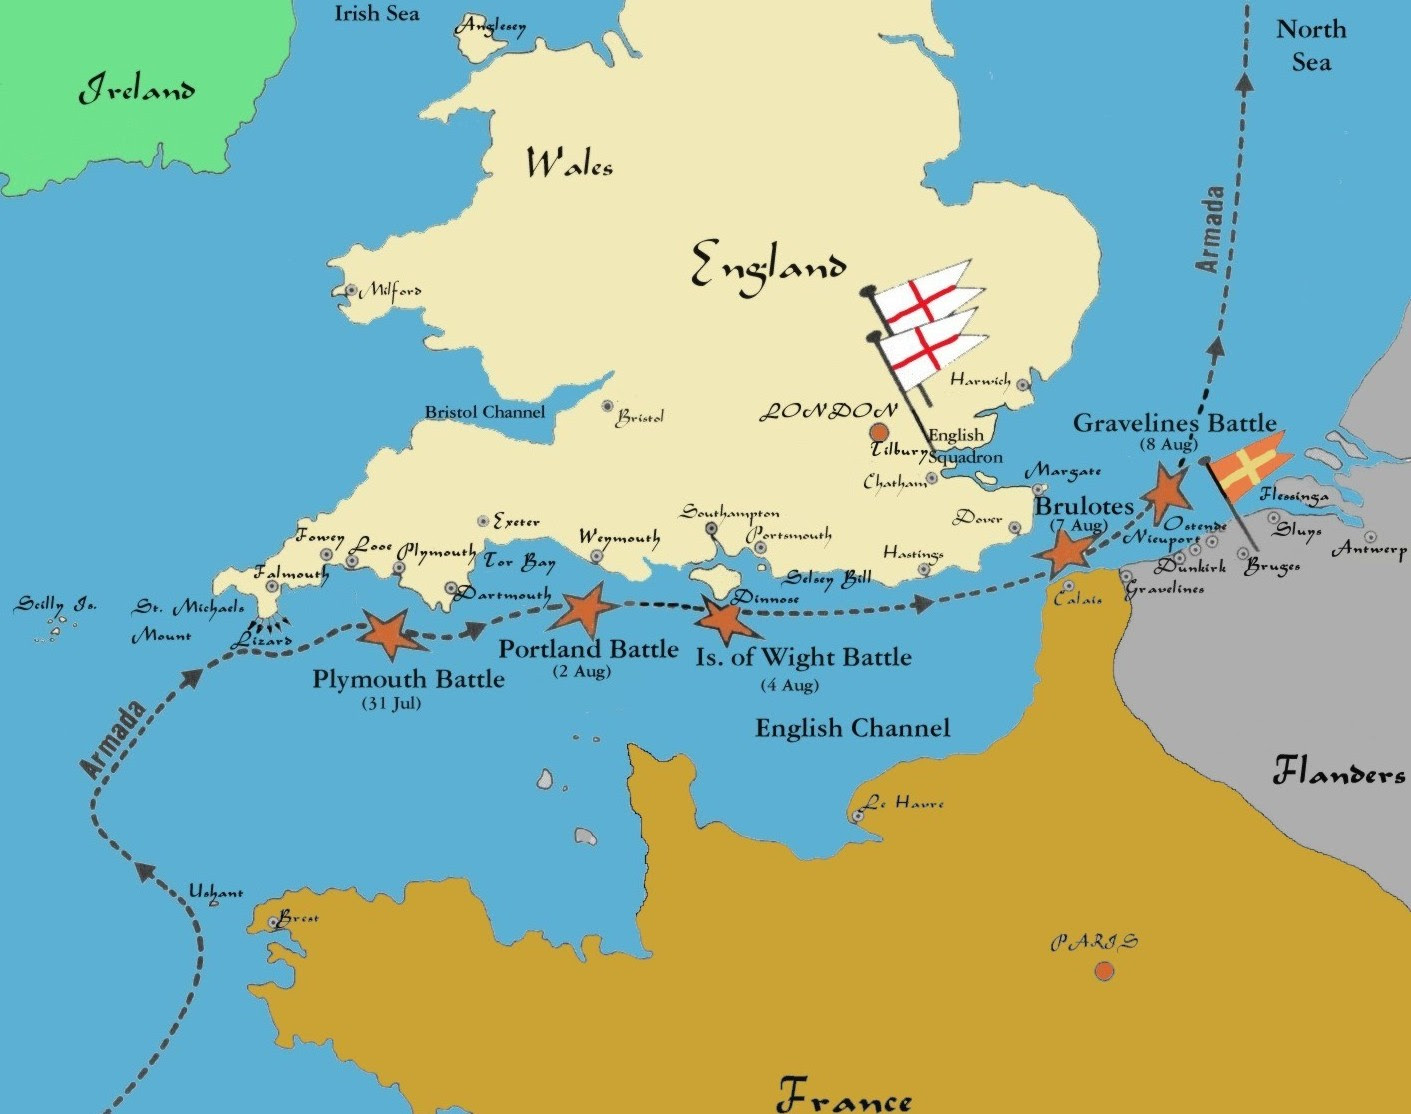 http://www.tudorplace.com.ar/Objetos/Maps/Armada_Map1.JPG